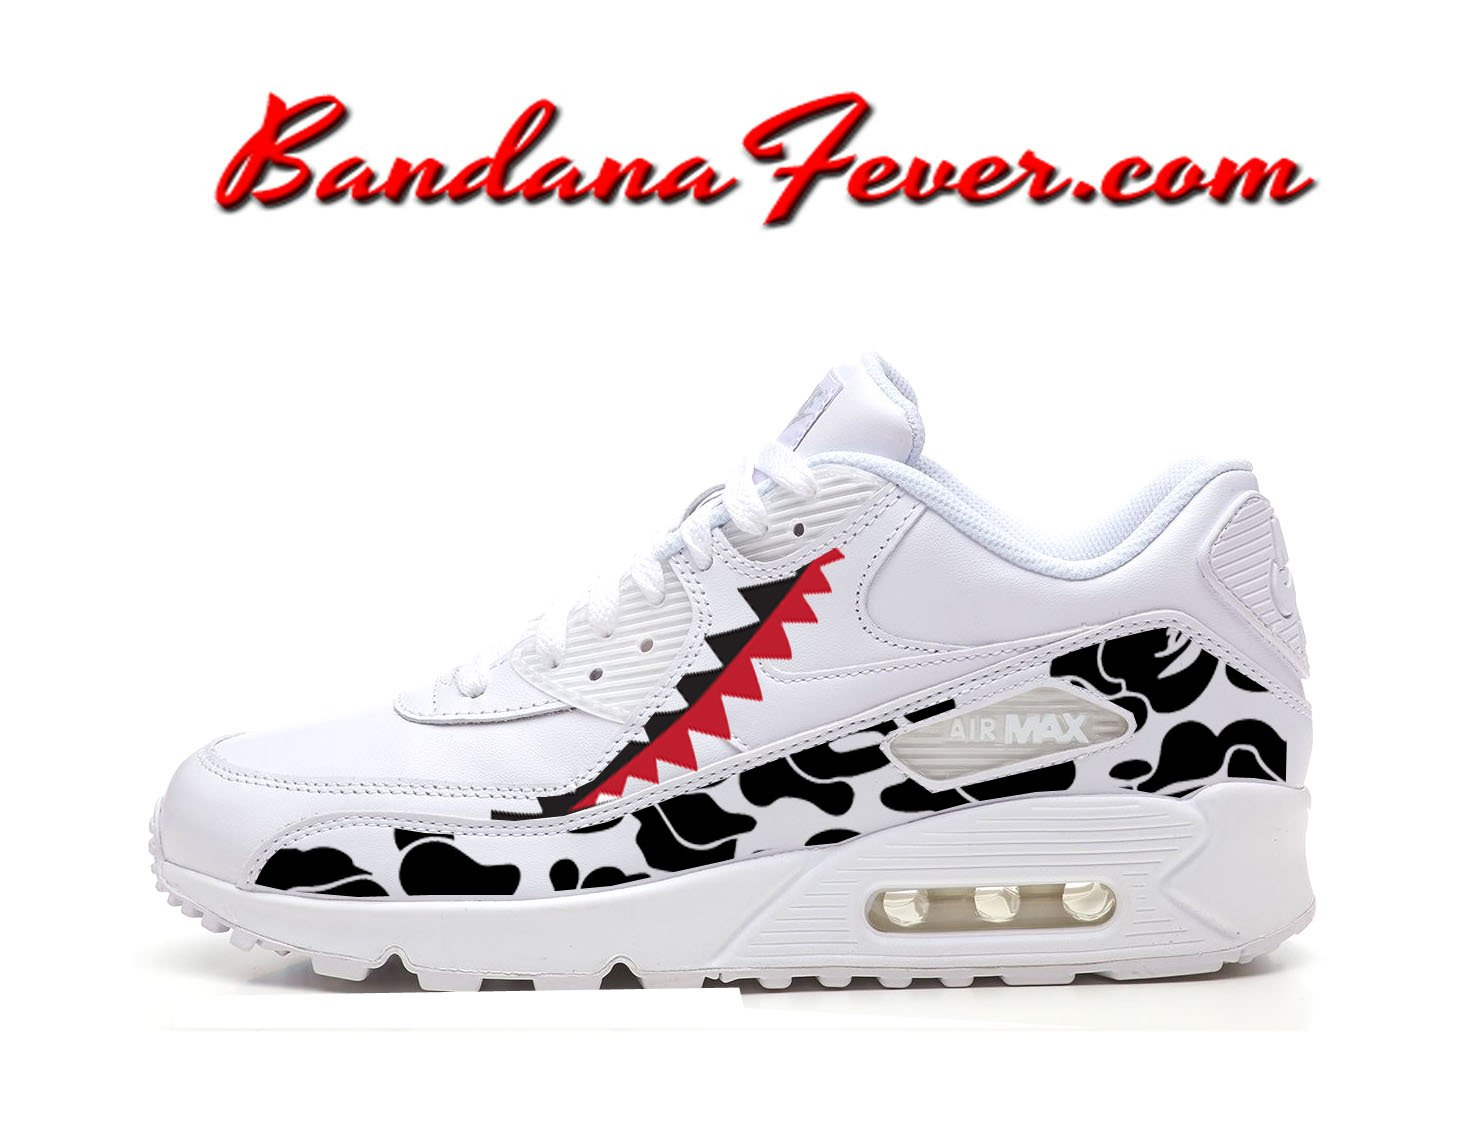 wholesale dealer 8d9b9 69e1f Custom Bape Camo Shark Nike Air Max 90 Shoes Ultra White, #bape, #camo,  #love, by Bandana Fever